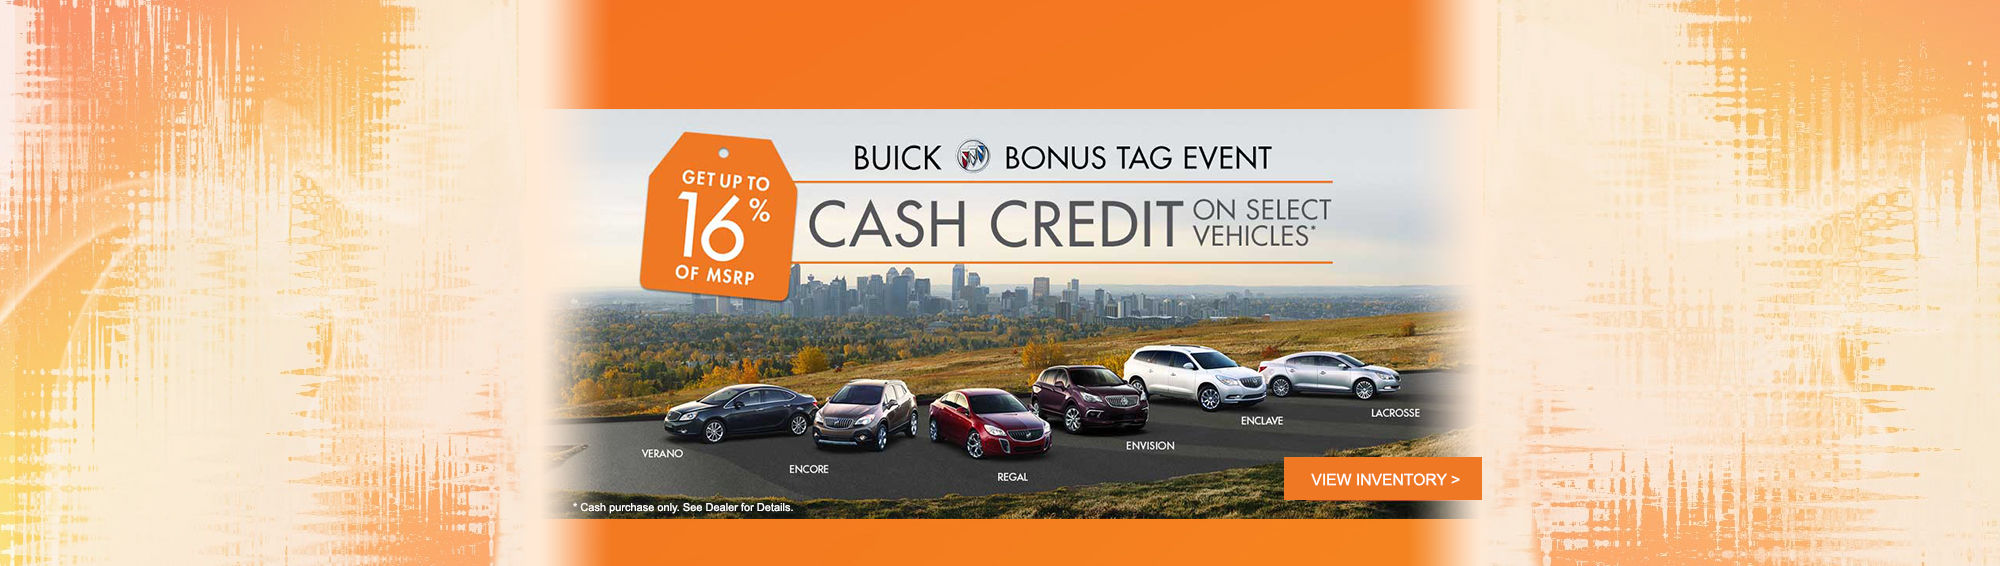 Buick Bonus Tag Event